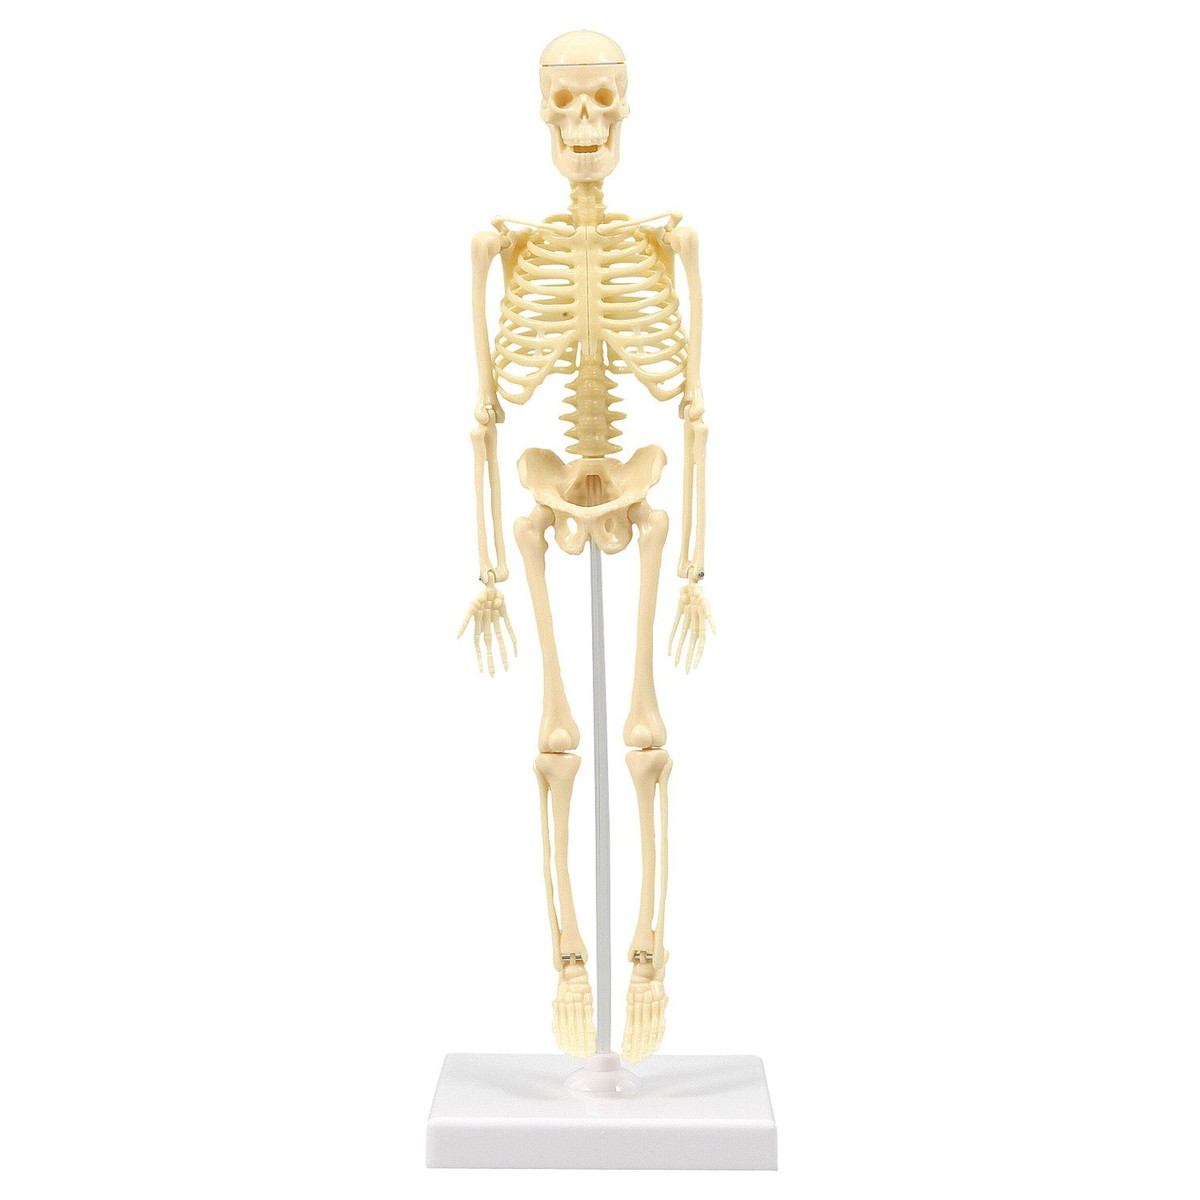 Artec(アーテック) 人体骨格模型 30cm学習セット(ケース入) #93609【送料無料】